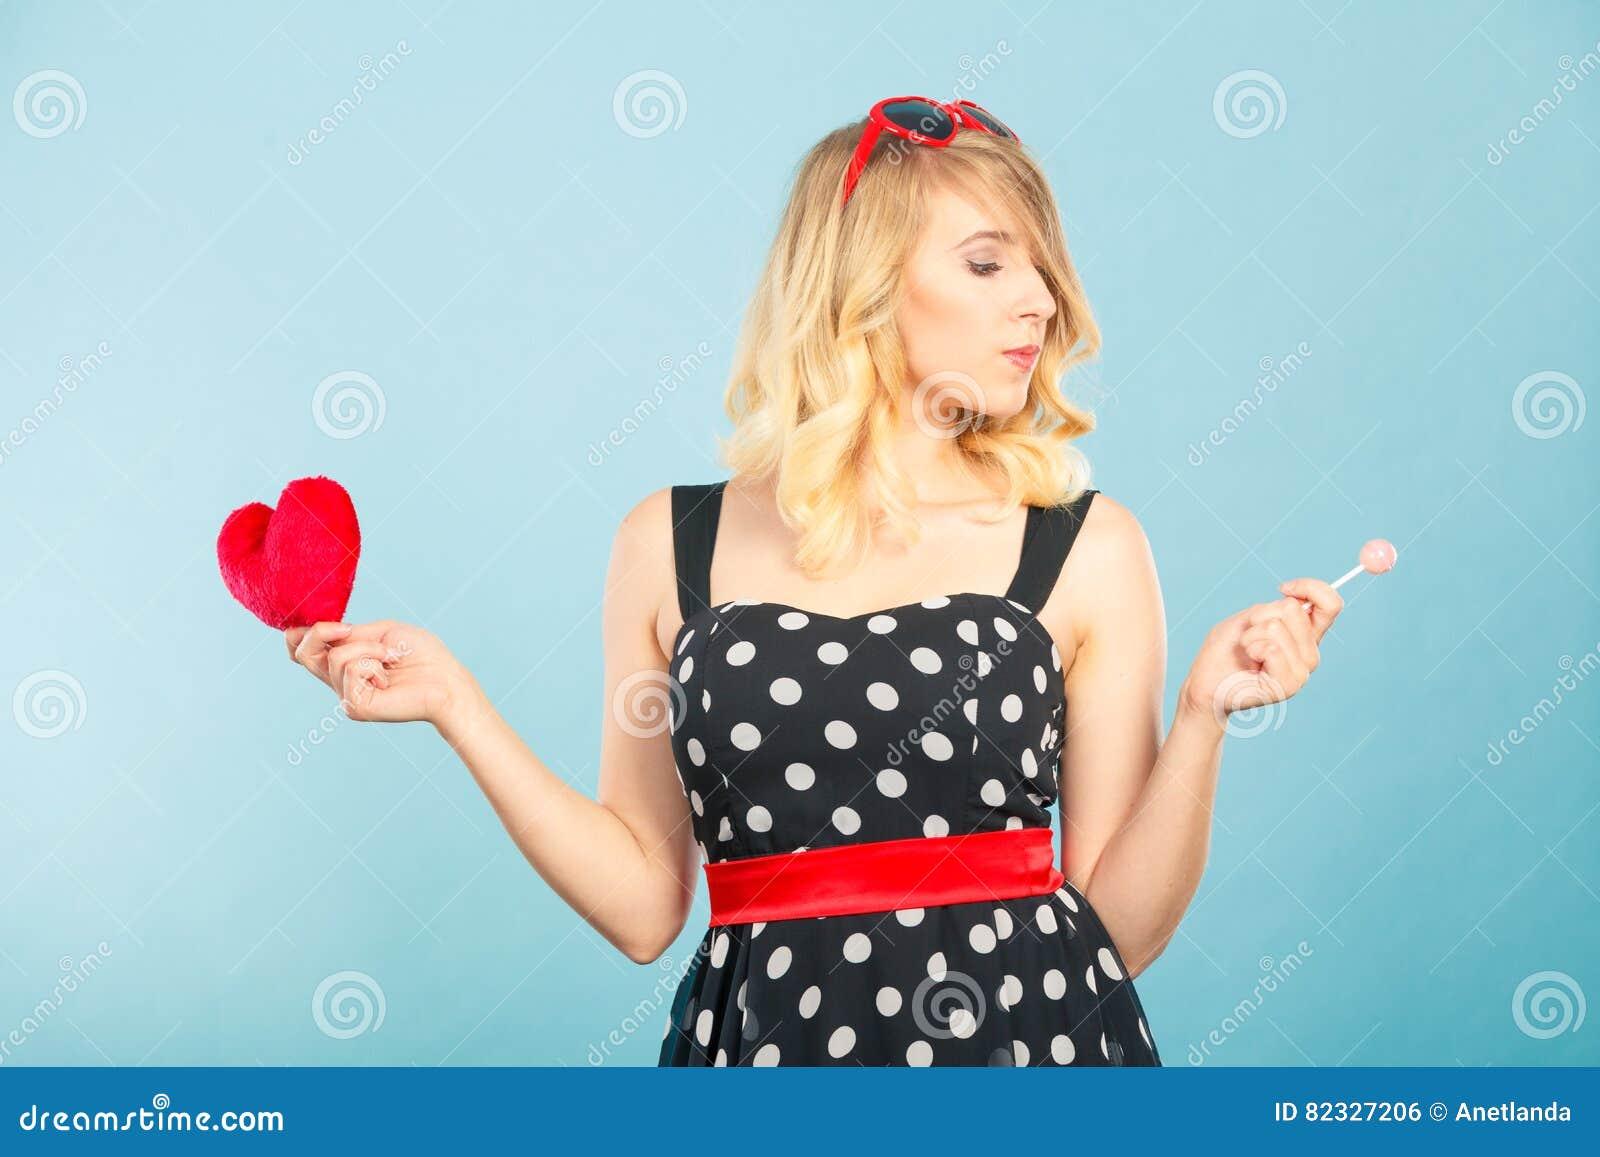 Lollipop dating